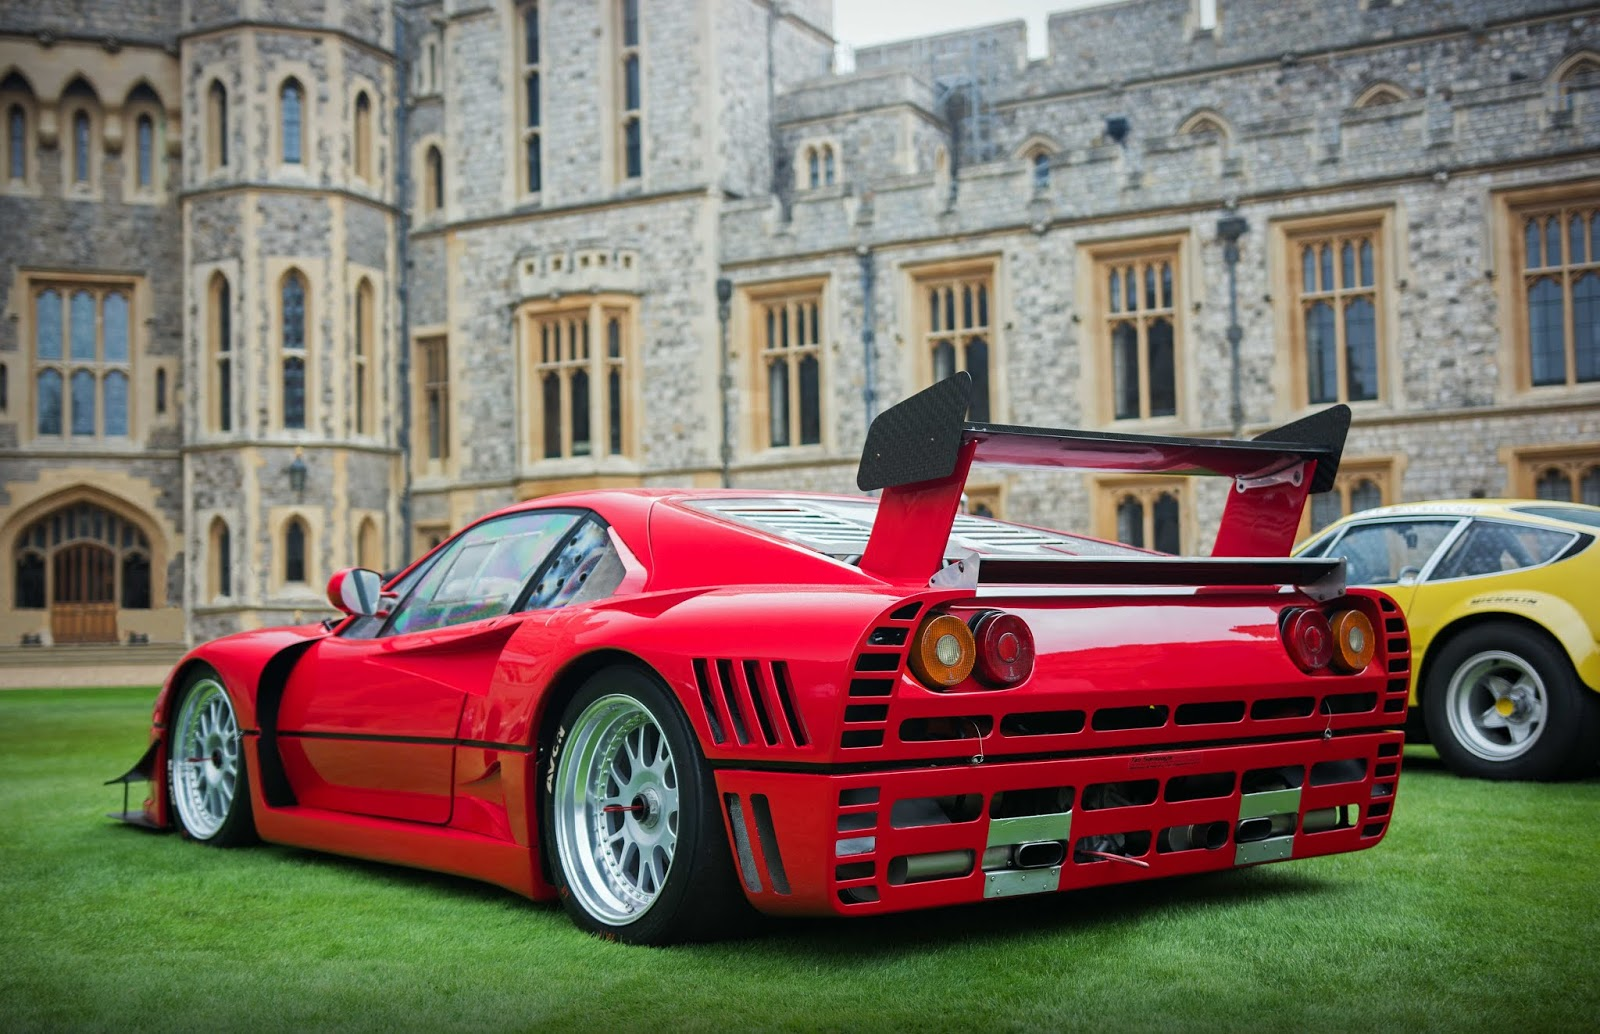 29613176654 071e39481a o 288 GTO. Η αρχή της Big 5 του Maranello 288, 288 GTO, Ferrari, GTO, retrocar, retrocar sunday, turbo, twin-turbo, V8, zblog